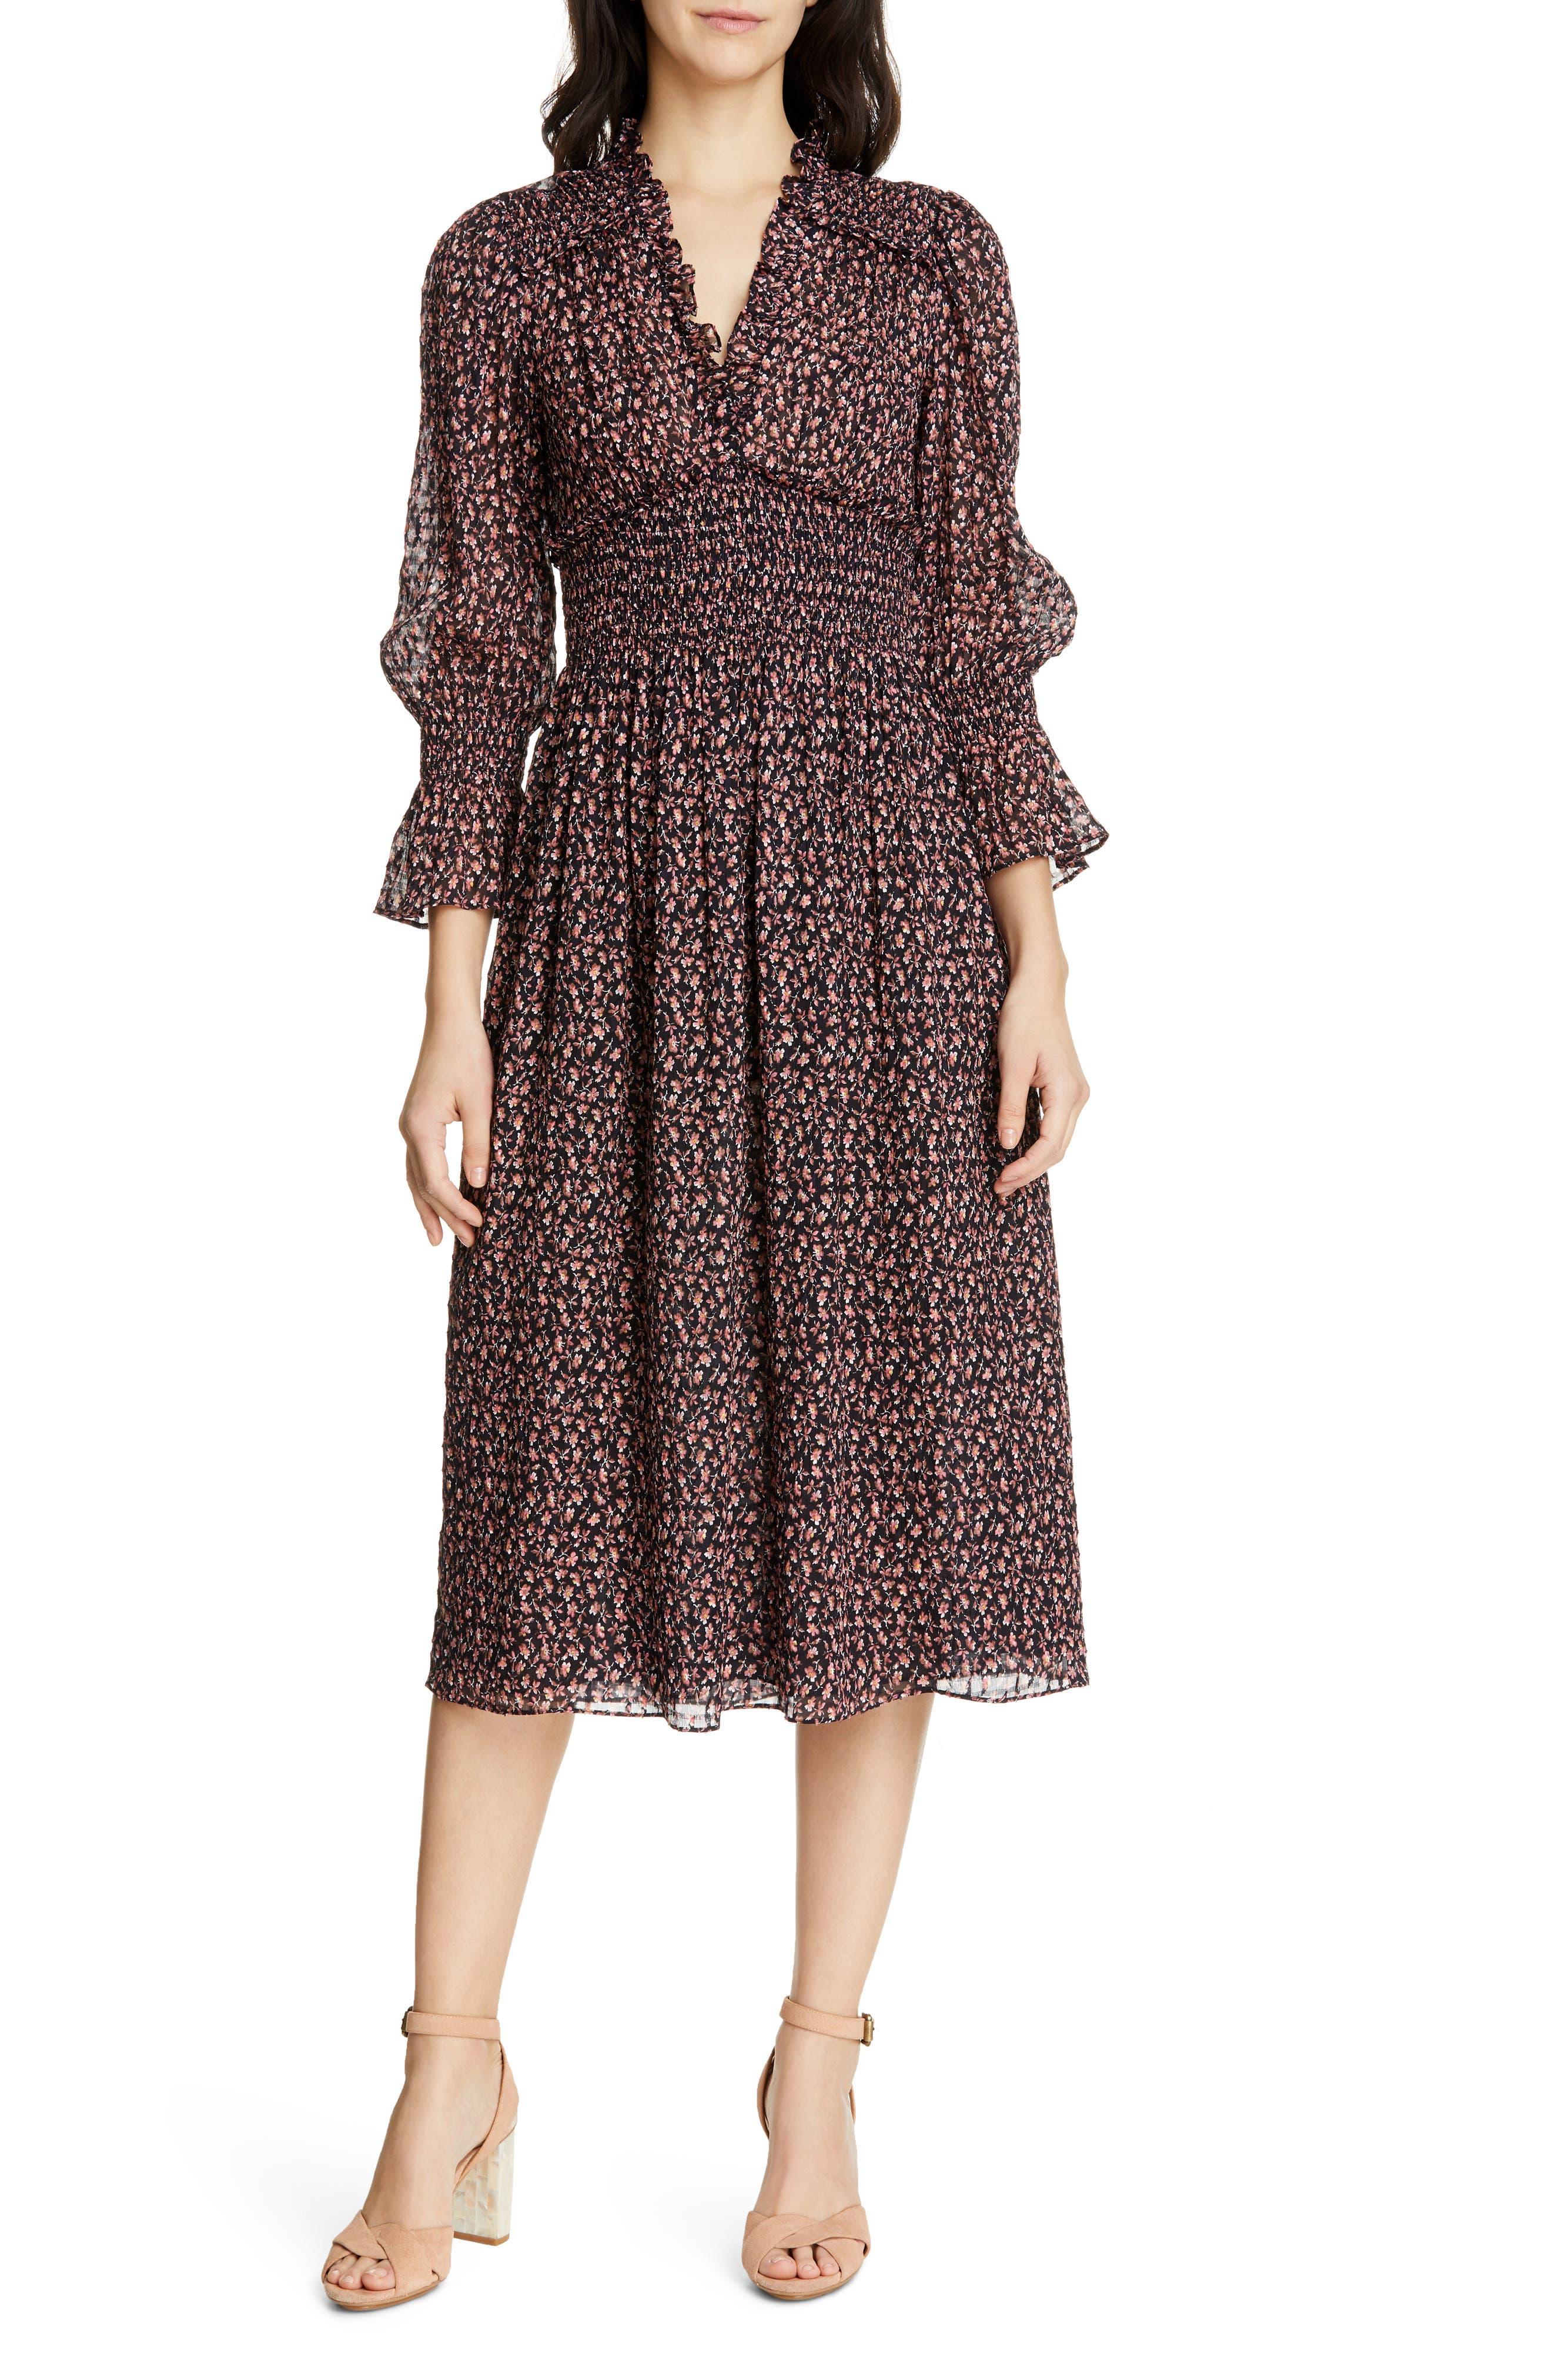 REBECCA TAYLOR, Floral Smock Detail Long Sleeve Silk & Cotton Dress, Main thumbnail 1, color, NAVY COMBO